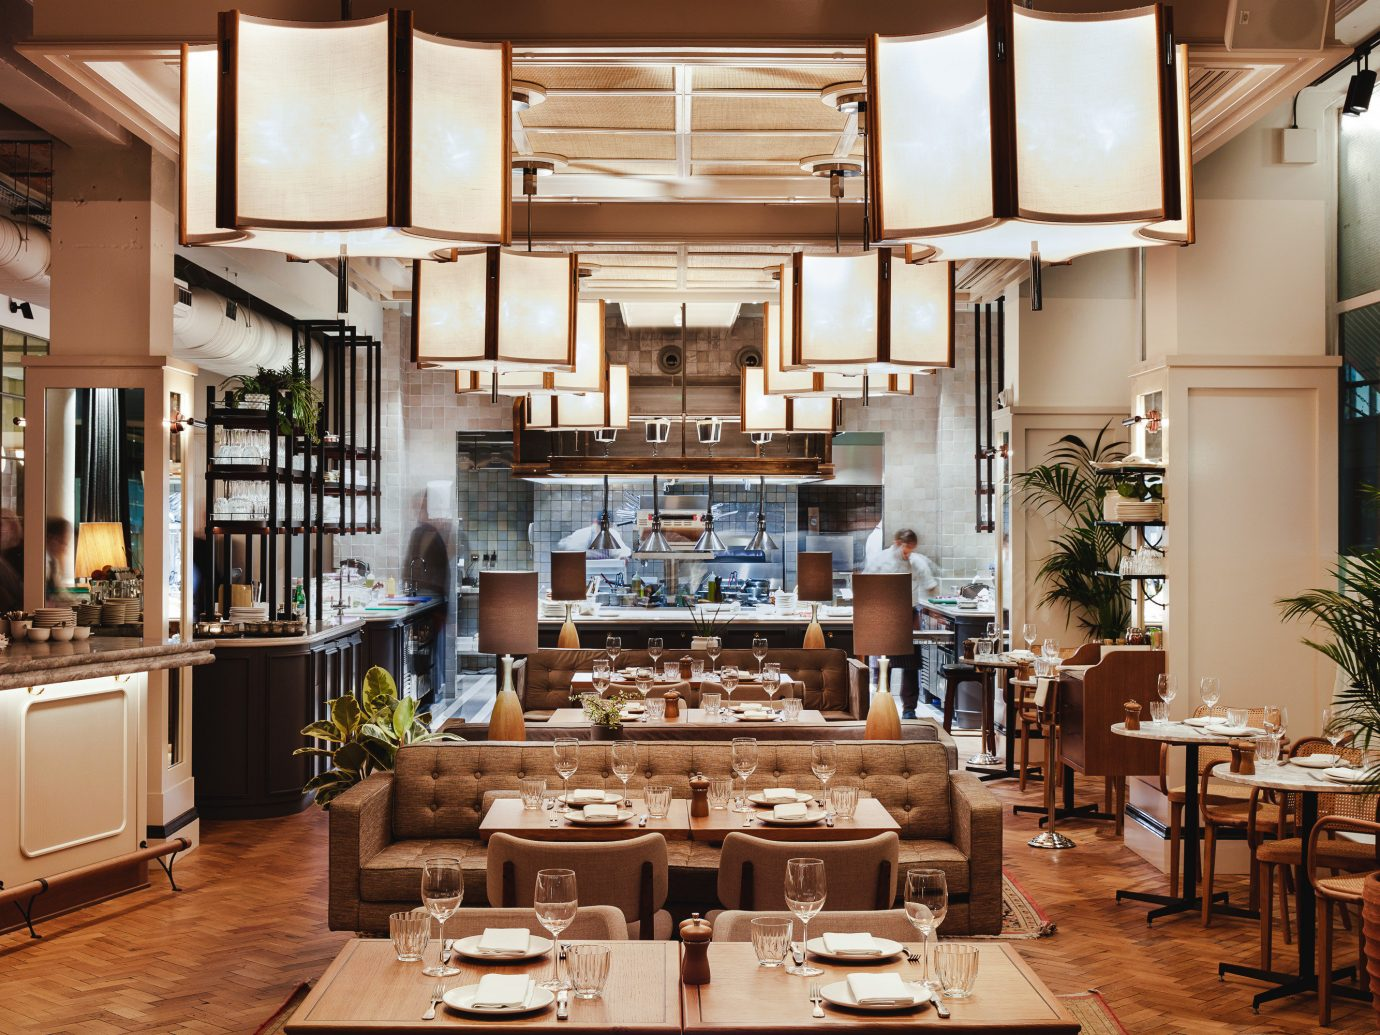 Food + Drink London indoor table floor window interior design restaurant wooden Dining wood furniture Island